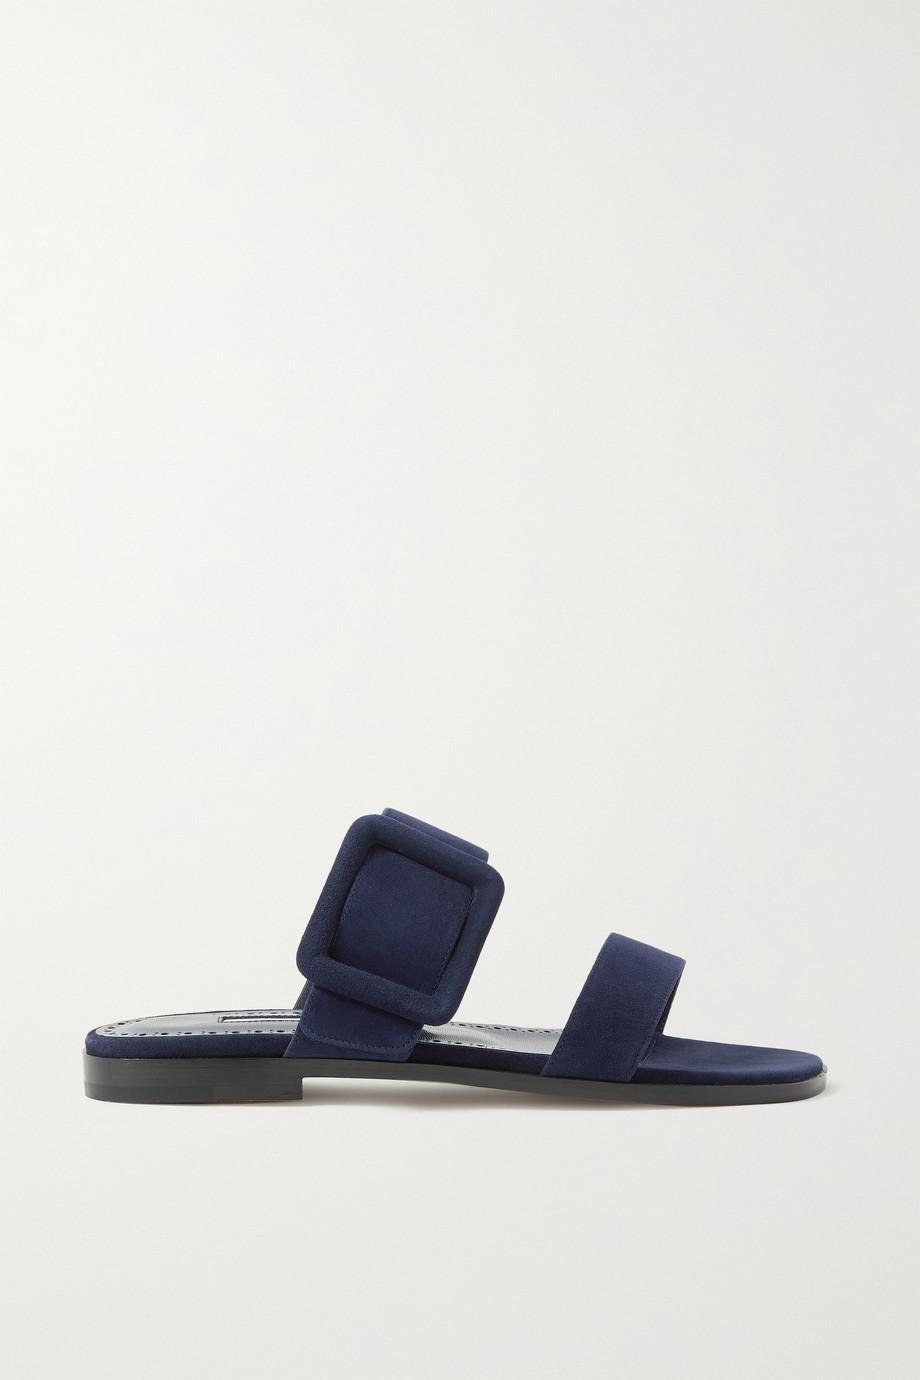 Manolo Blahnik Tituba buckled suede sandals